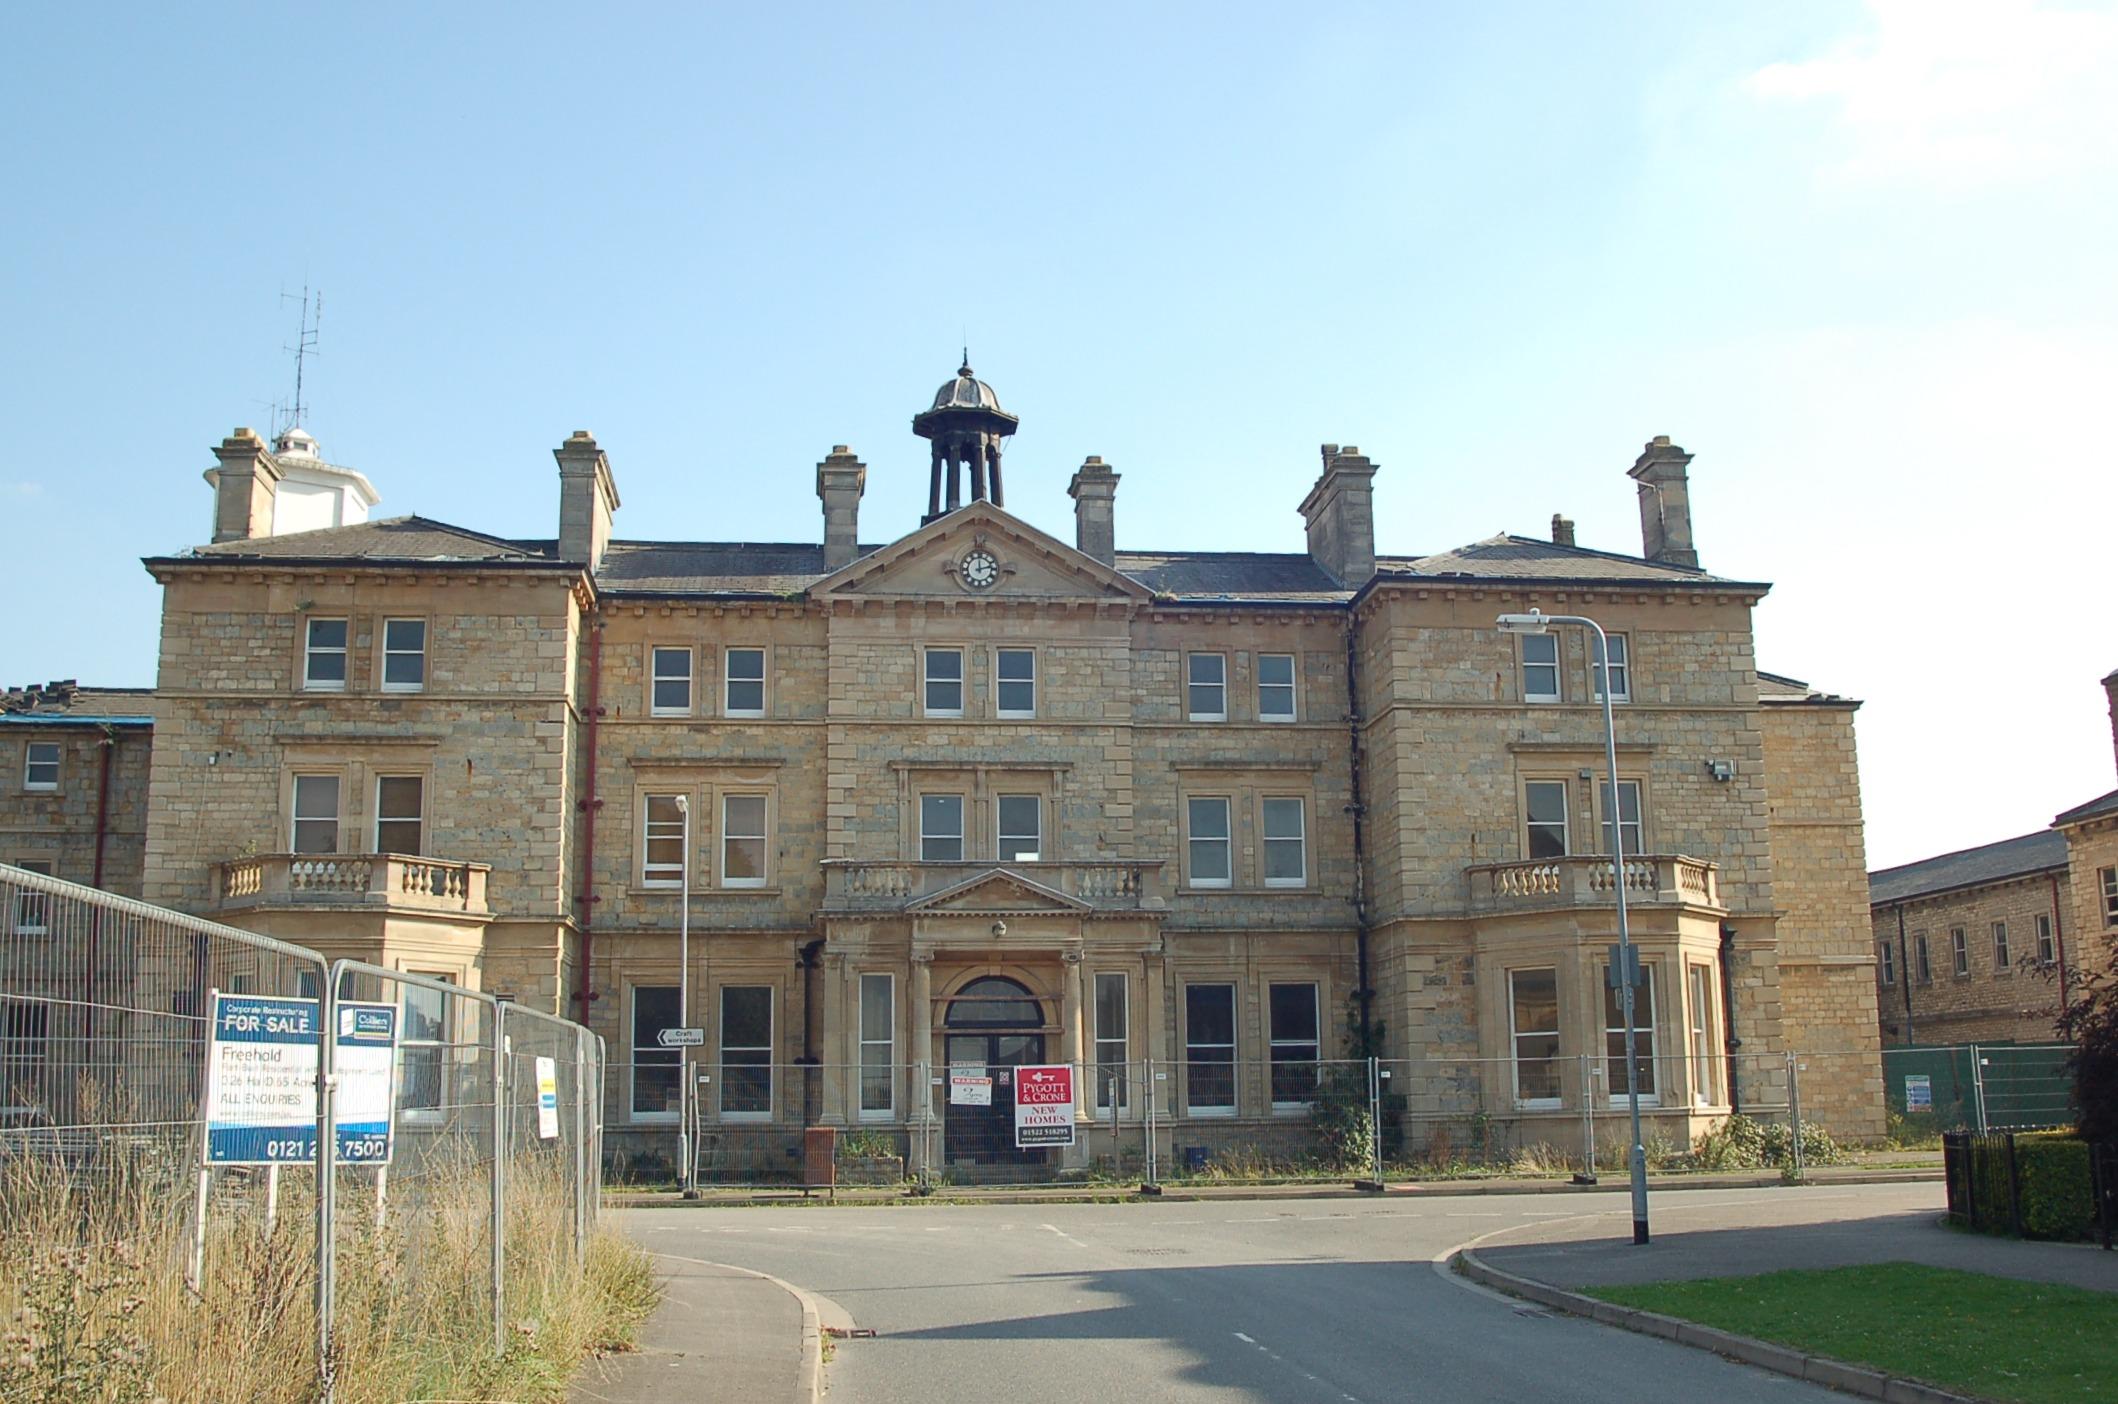 John Property Developer Birtle Bury